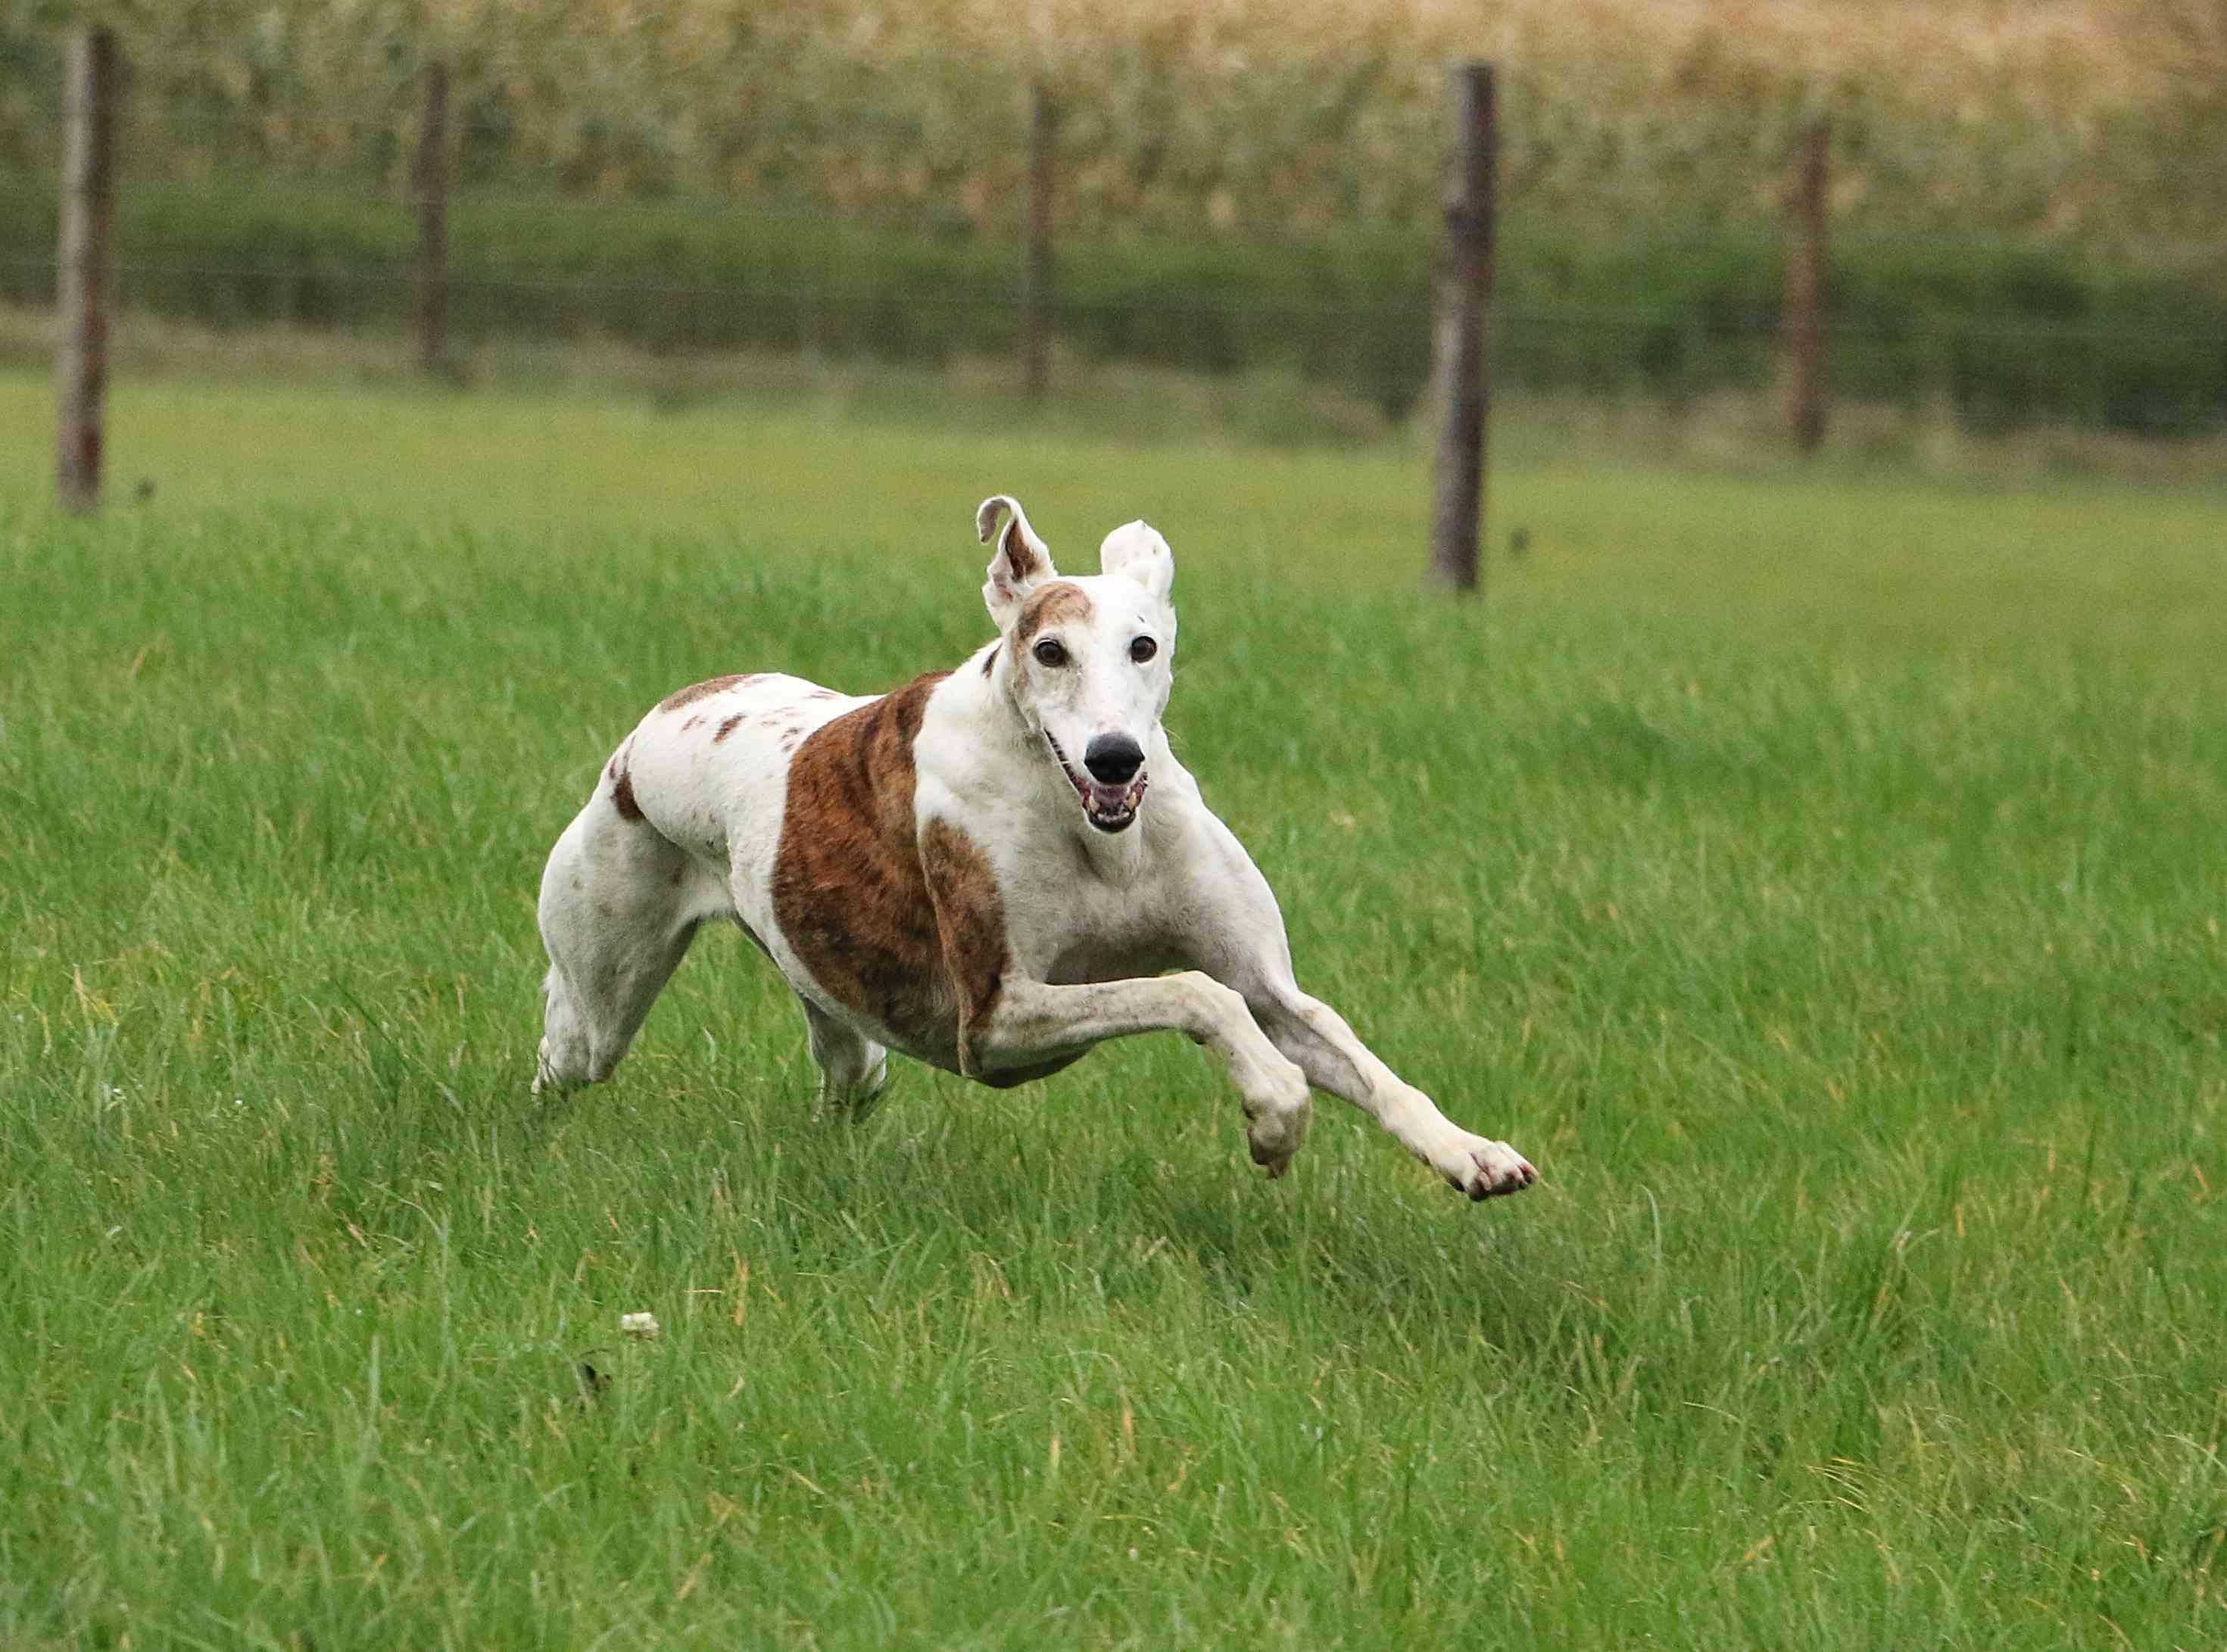 Greyhound running in grassy field